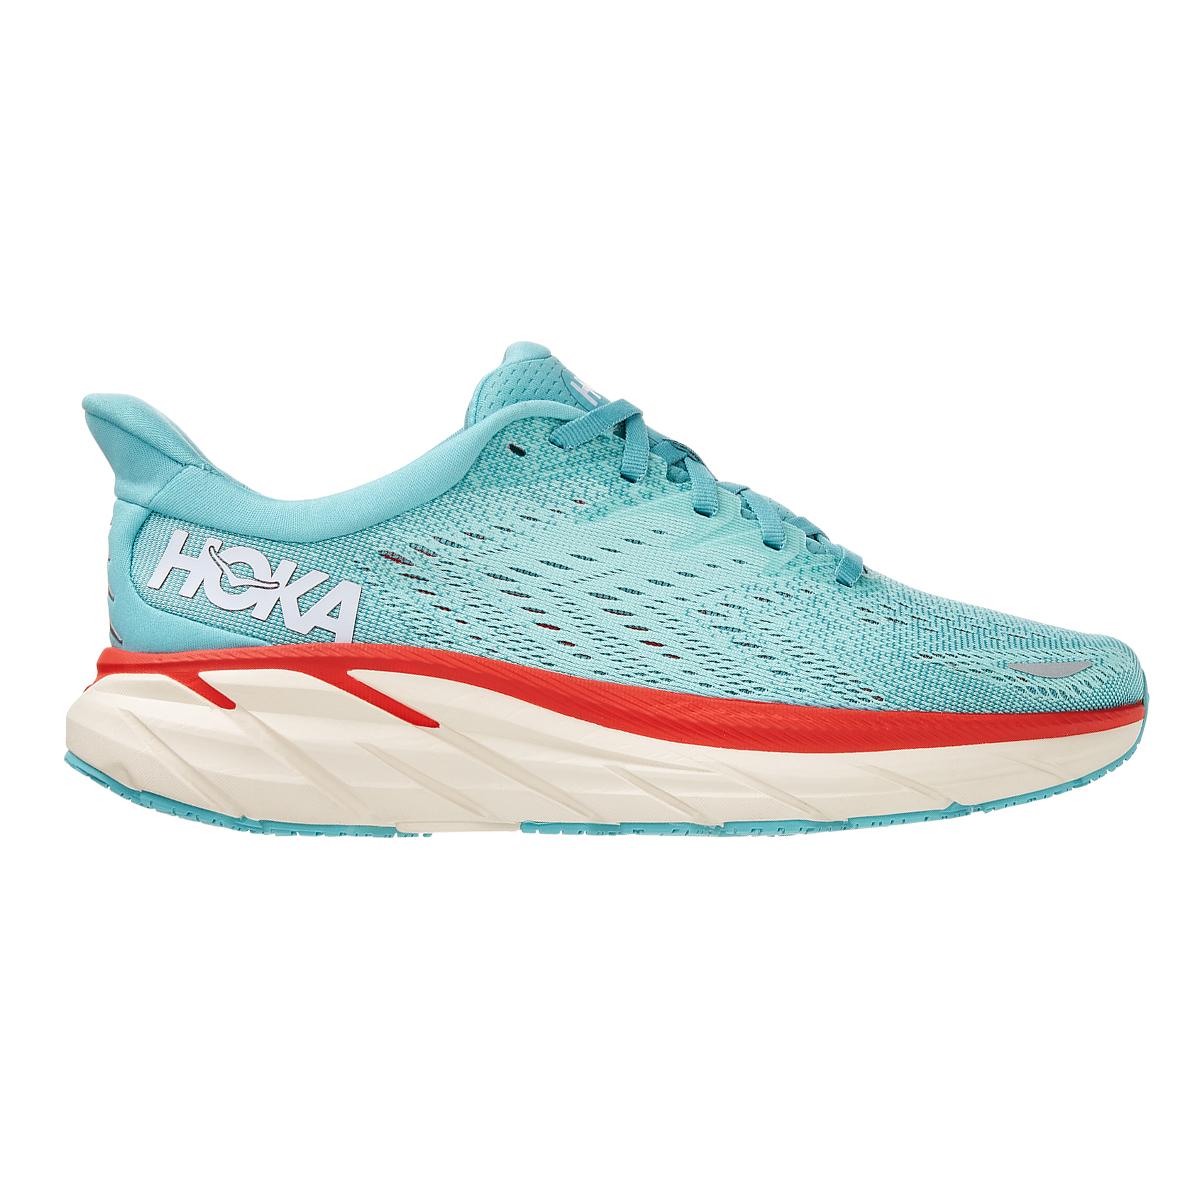 Women's Hoka One One Clifton 8 Running Shoe - Color: Aquarelle / Eggshell Blue - Size: 5 - Width: Regular, Aquarelle / Eggshell Blue, large, image 1